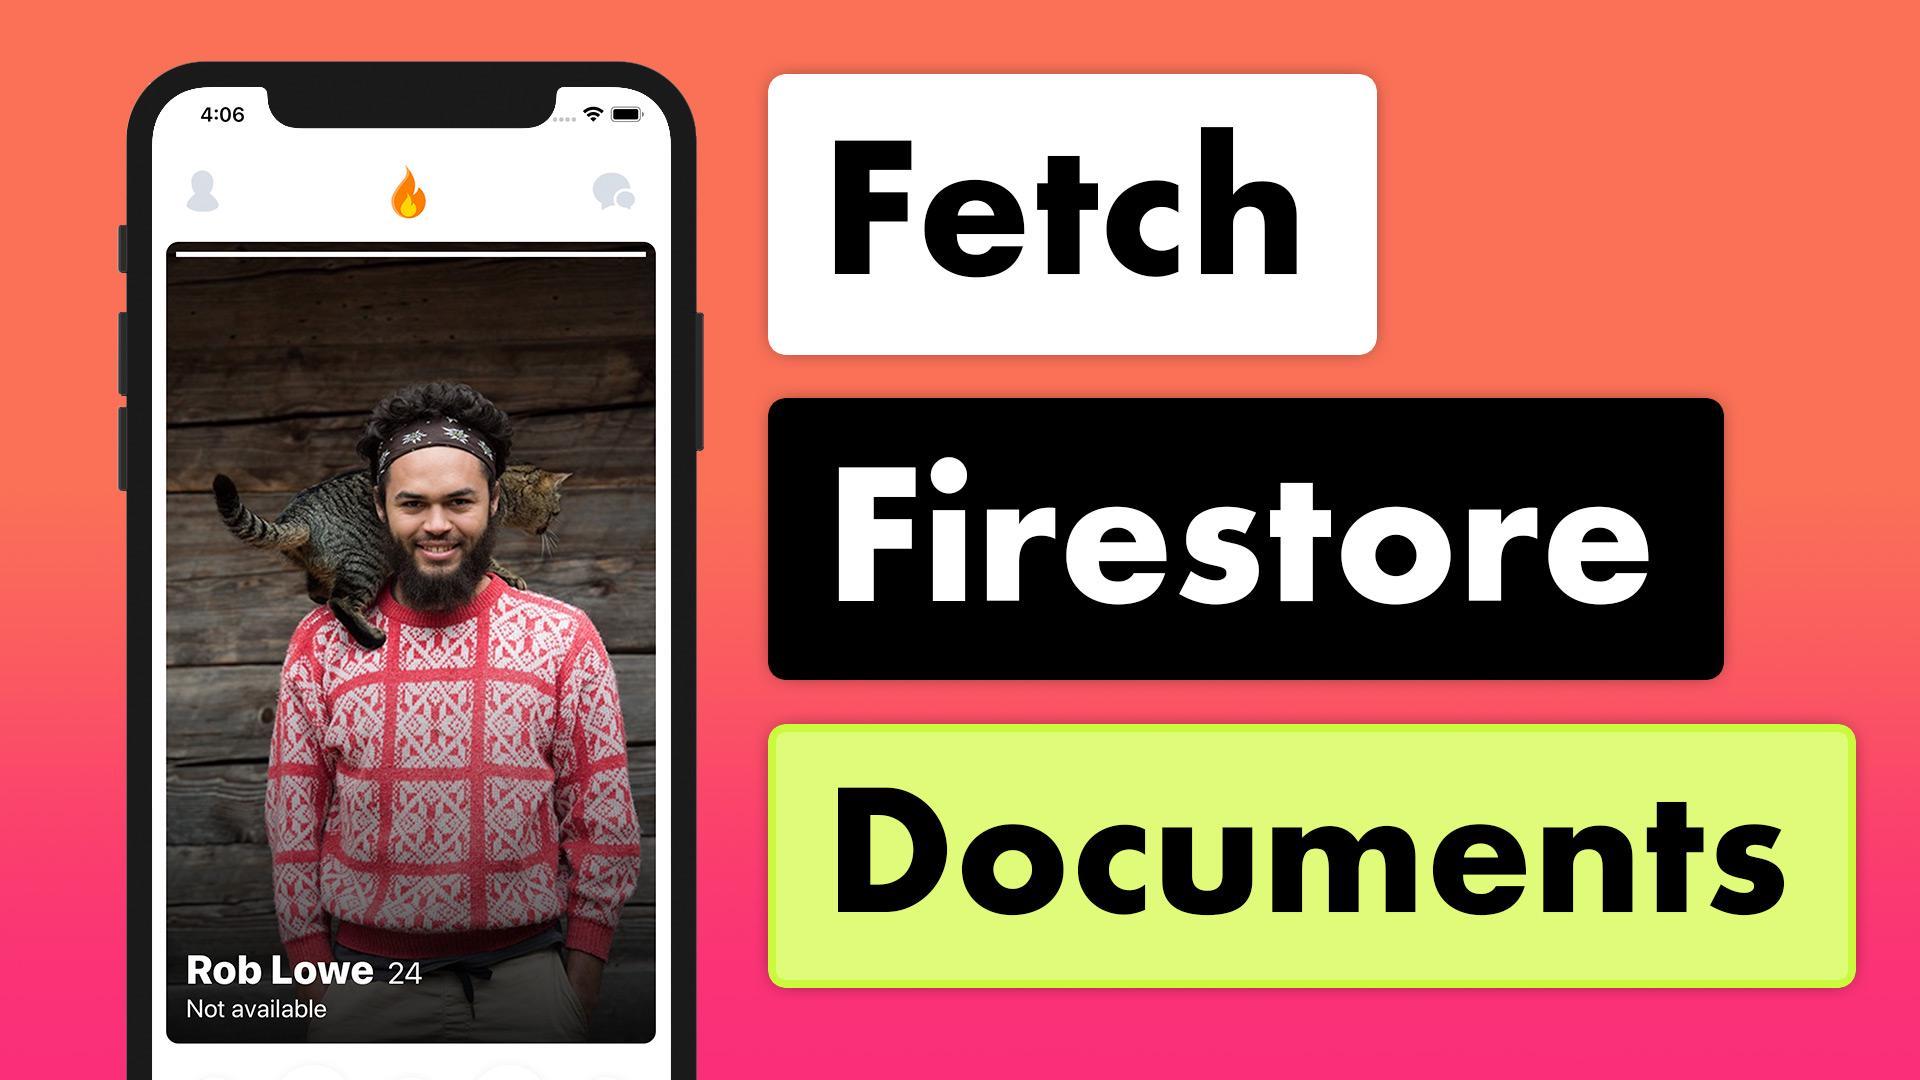 Tinder Firestore MVVM 21 - Fetch Firestore Documents | Lets Build